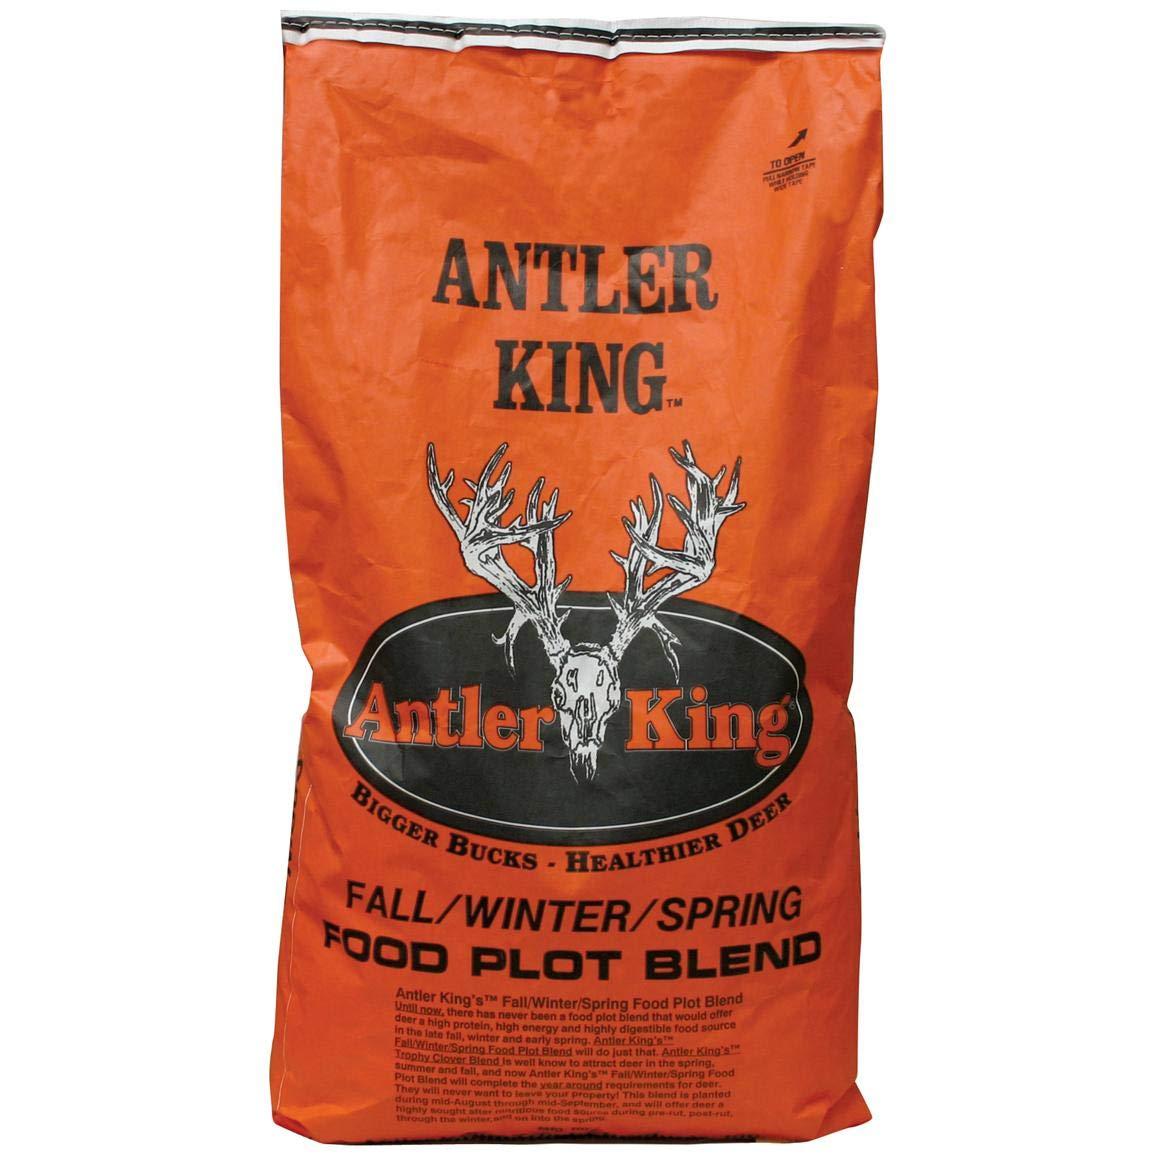 Antler King Fall/Winter/Spring Food Plot Blend